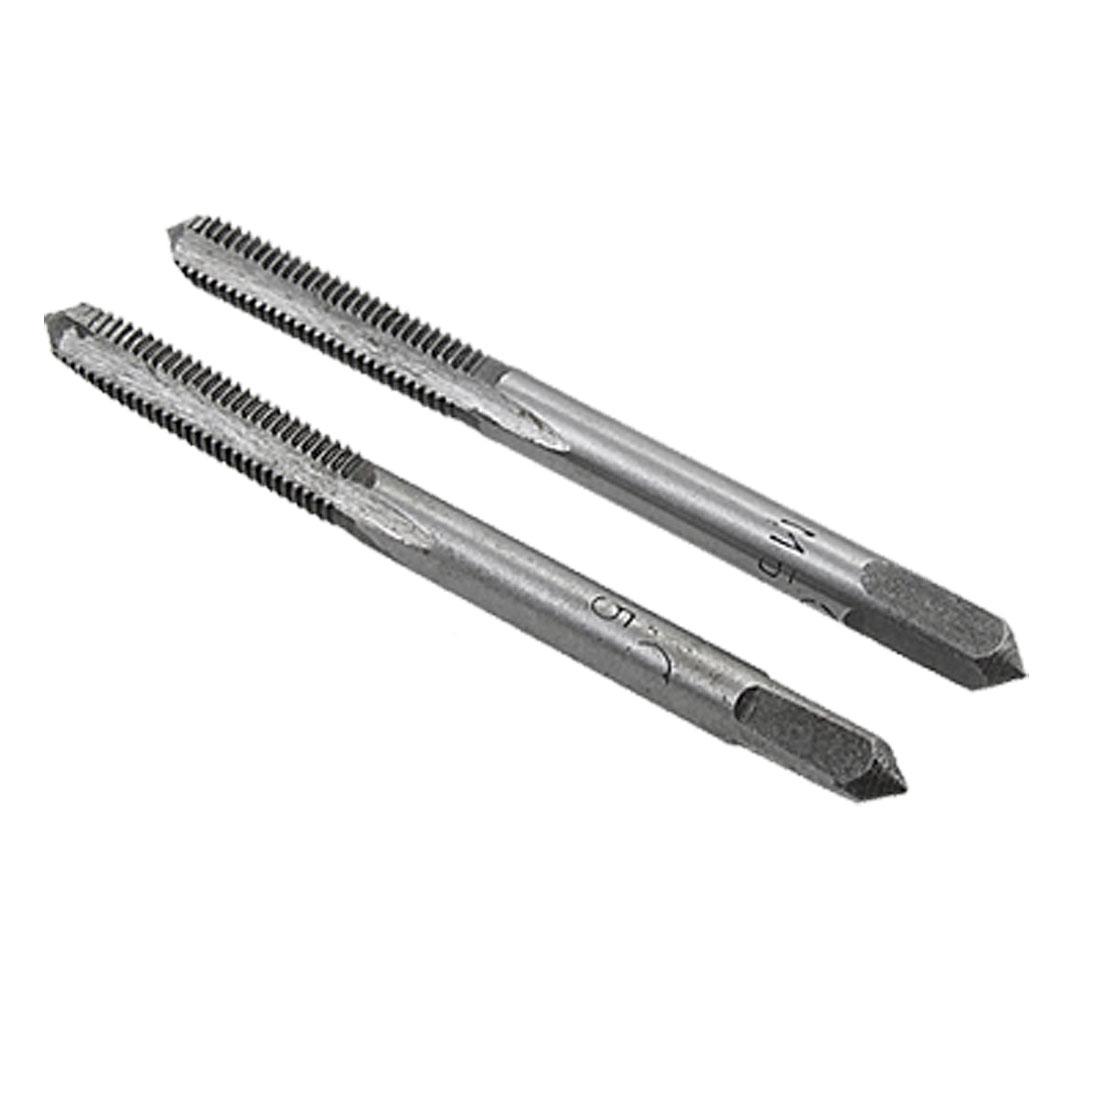 5mm Diameter Spiral Point Tap Spring Steel Taper Taps Pair